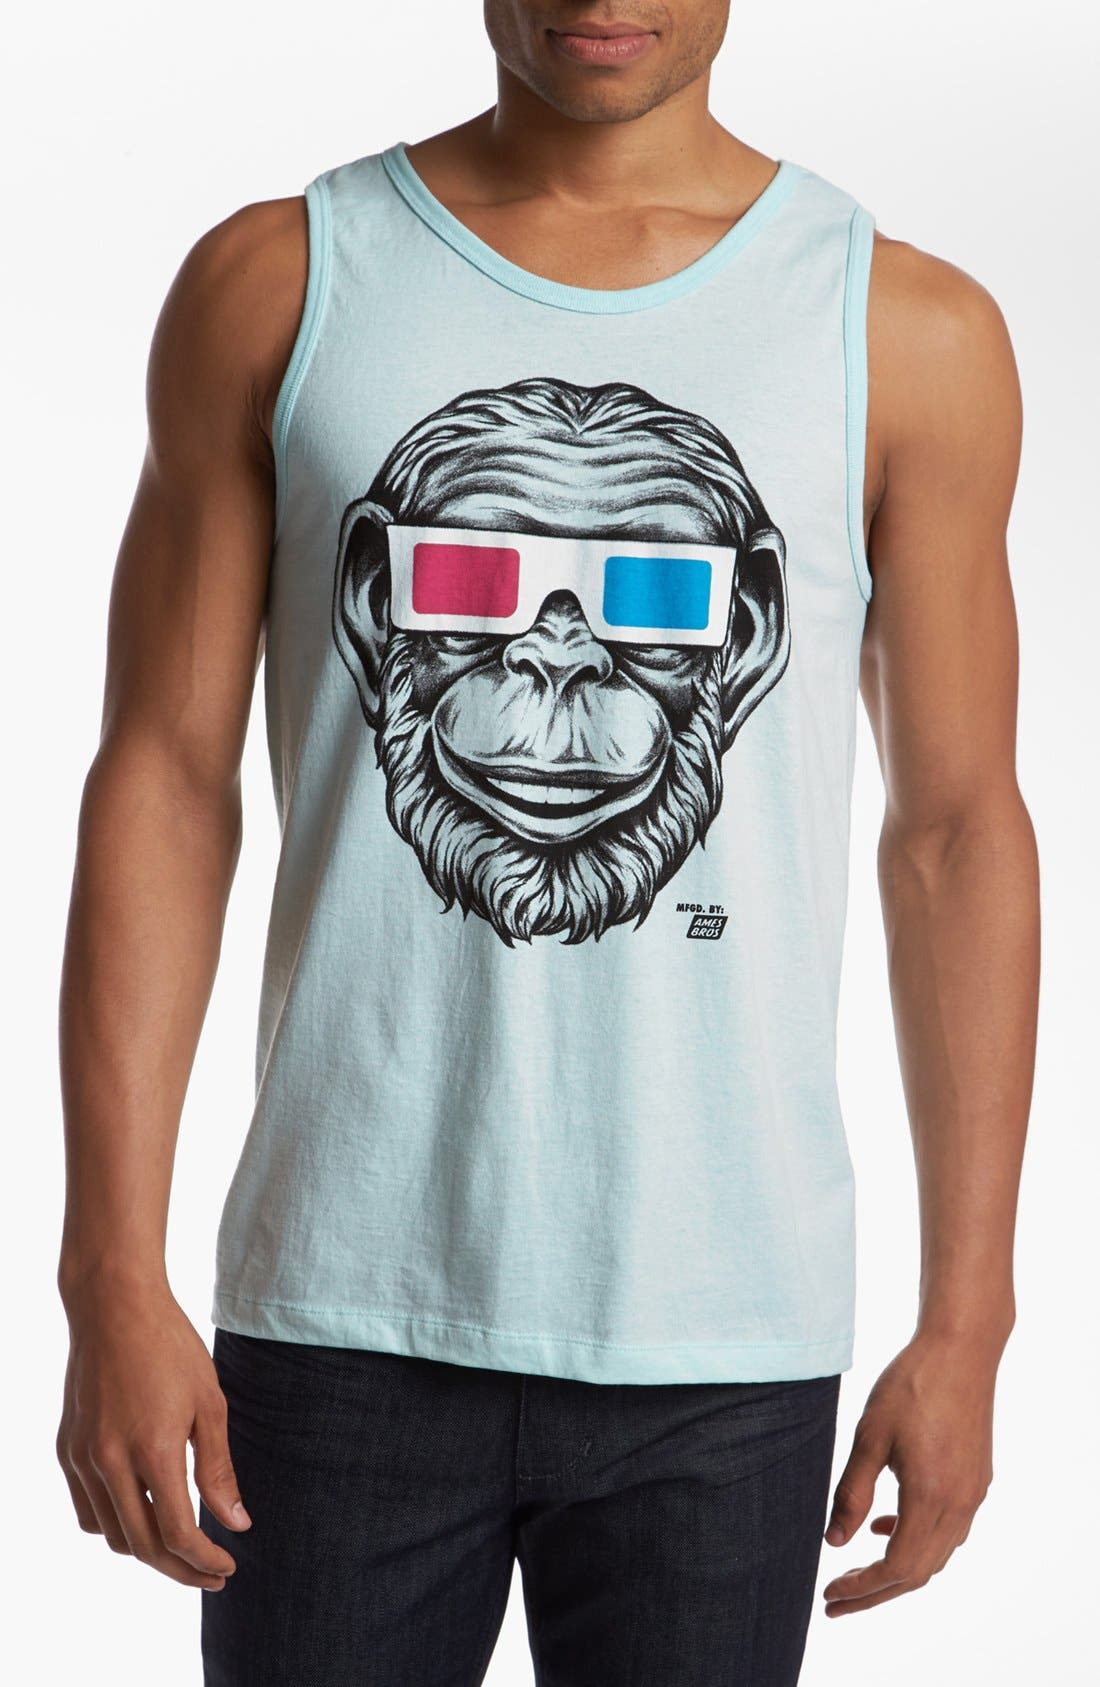 Main Image - Ames Bros '3D Monkey' Tank Top